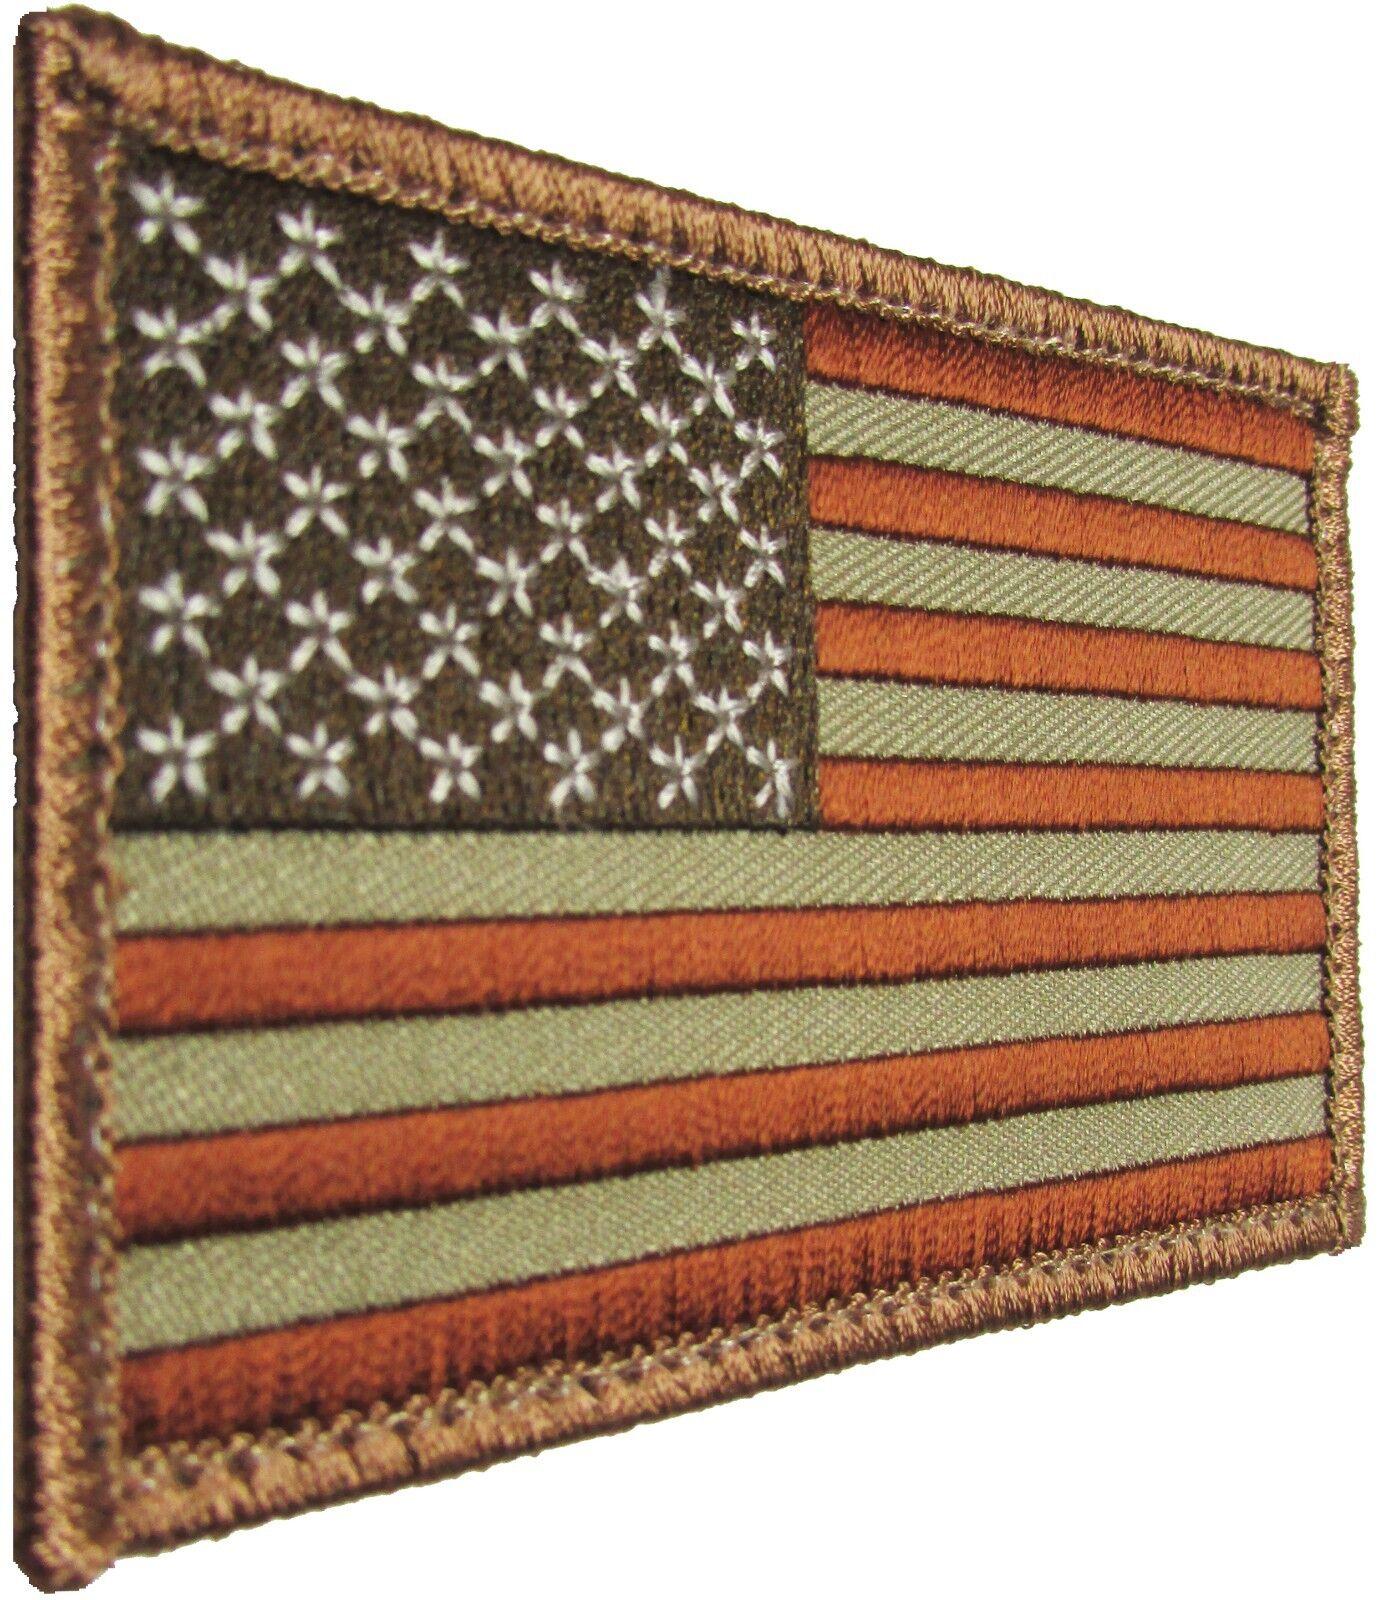 USA AMERICAN FLAG TACTICAL US MORALE MILITARY DESERT VELCRO